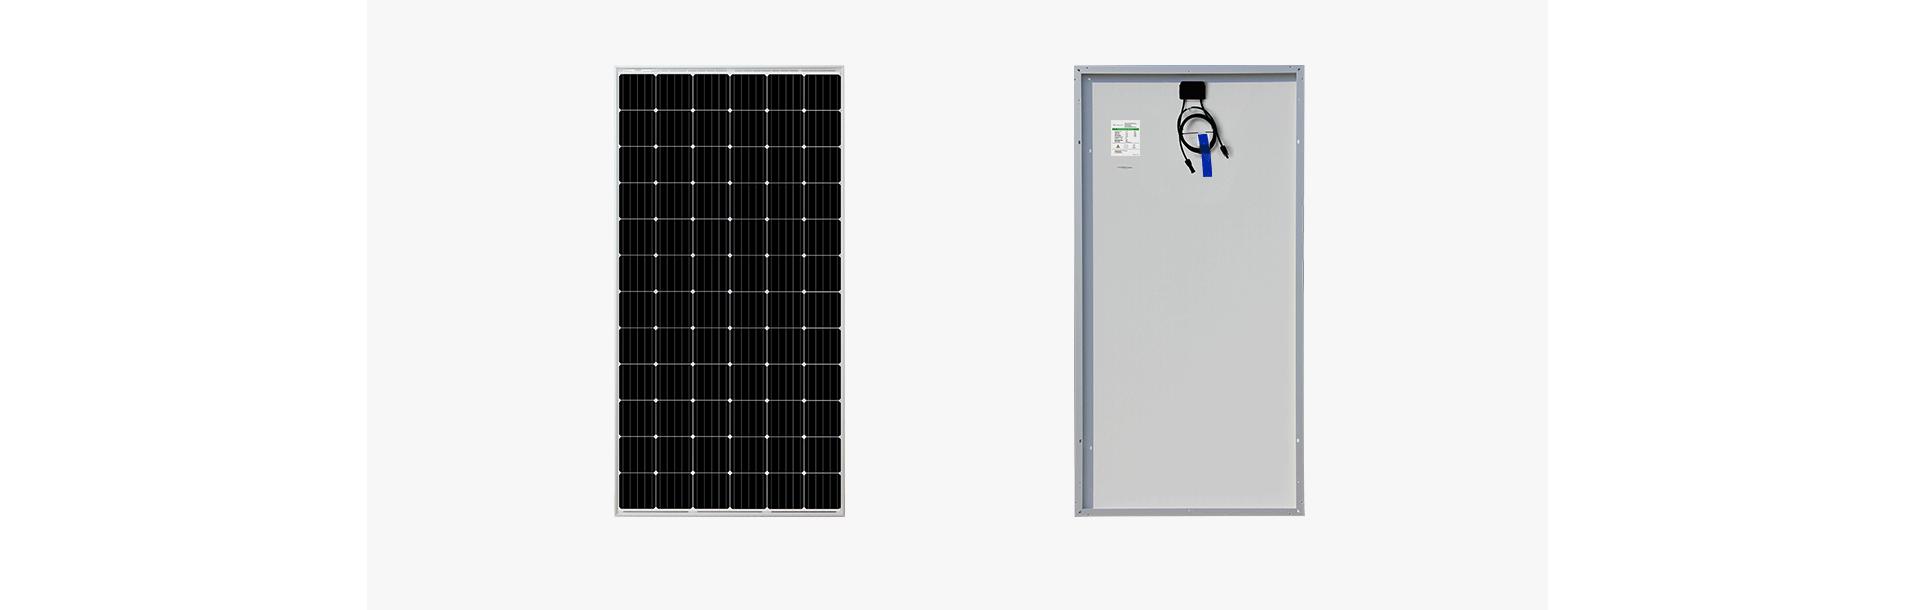 LvchenSolar 360W-365W Mono PERC solar panel - Nanjing Moge New